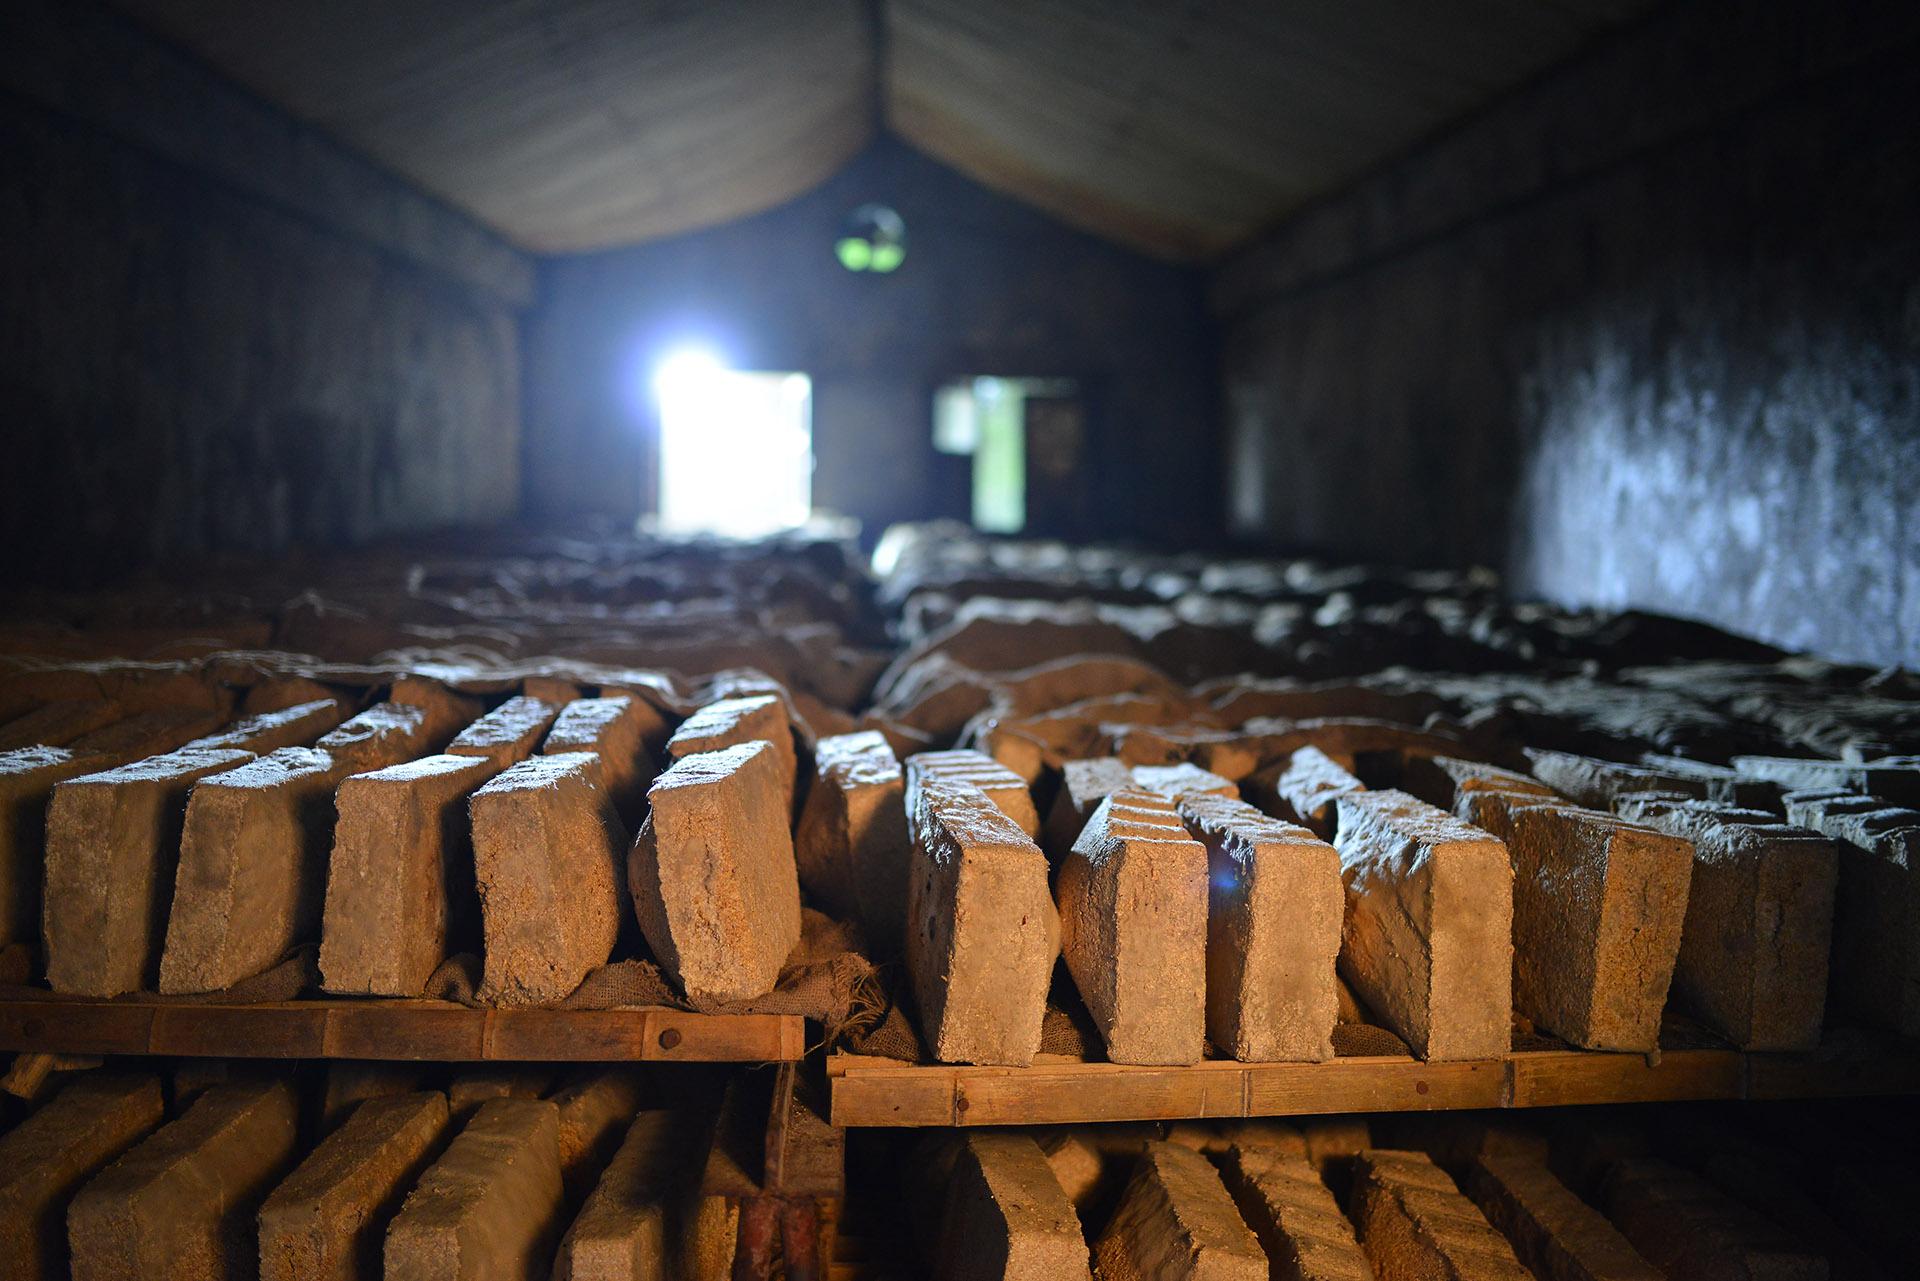 Ming River Baijiu - Bricks of Qu. Natural yeast cultures for baijiu fermentation